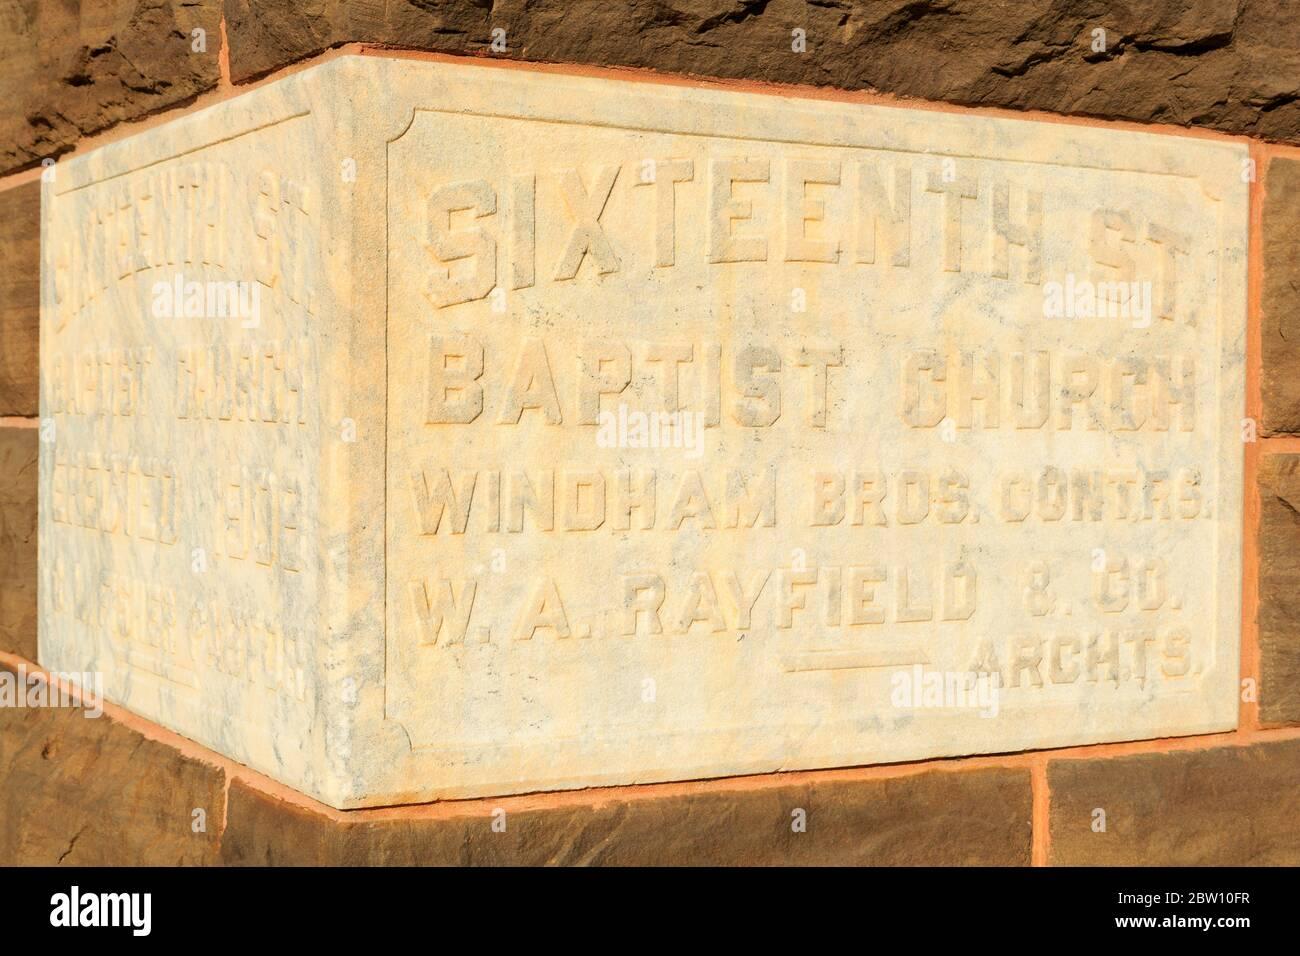 Sixteenth Street Baptist Church,Birmingham,Alabama,USA Stock Photo